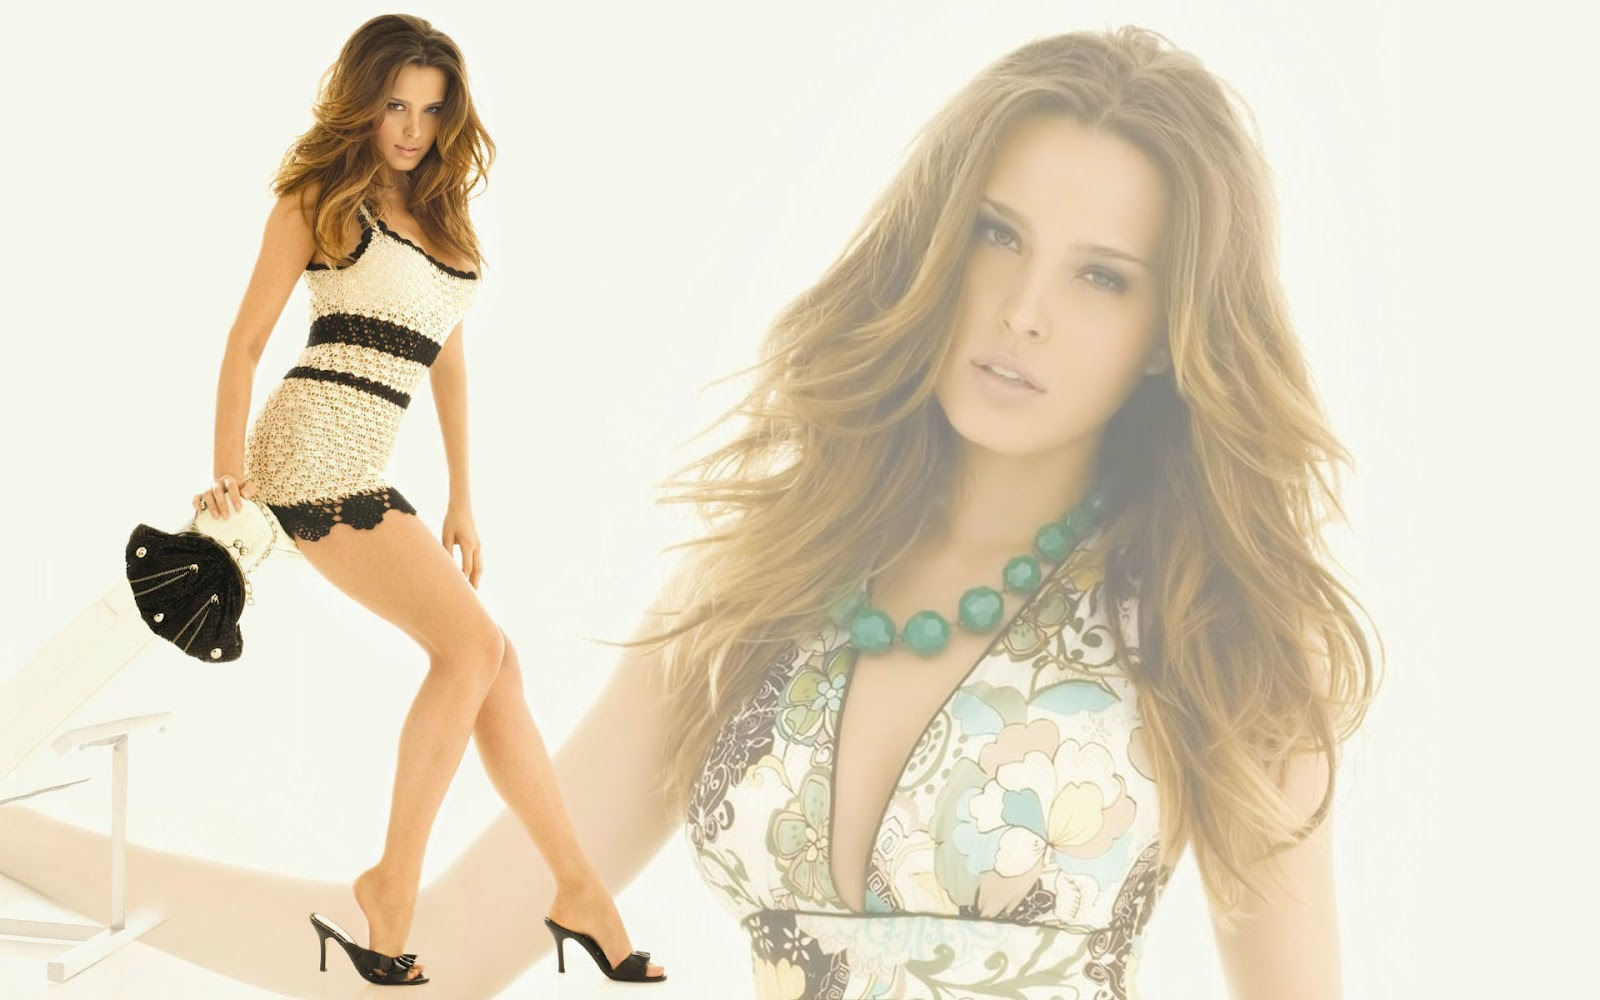 http://3.bp.blogspot.com/-kr3RGlUA_sY/UFGSXJllPOI/AAAAAAAADTg/IWSK-x8jYCE/s1600/Wallpaper+Full+HD+Hot+Girl+Amazing+(39).jpg